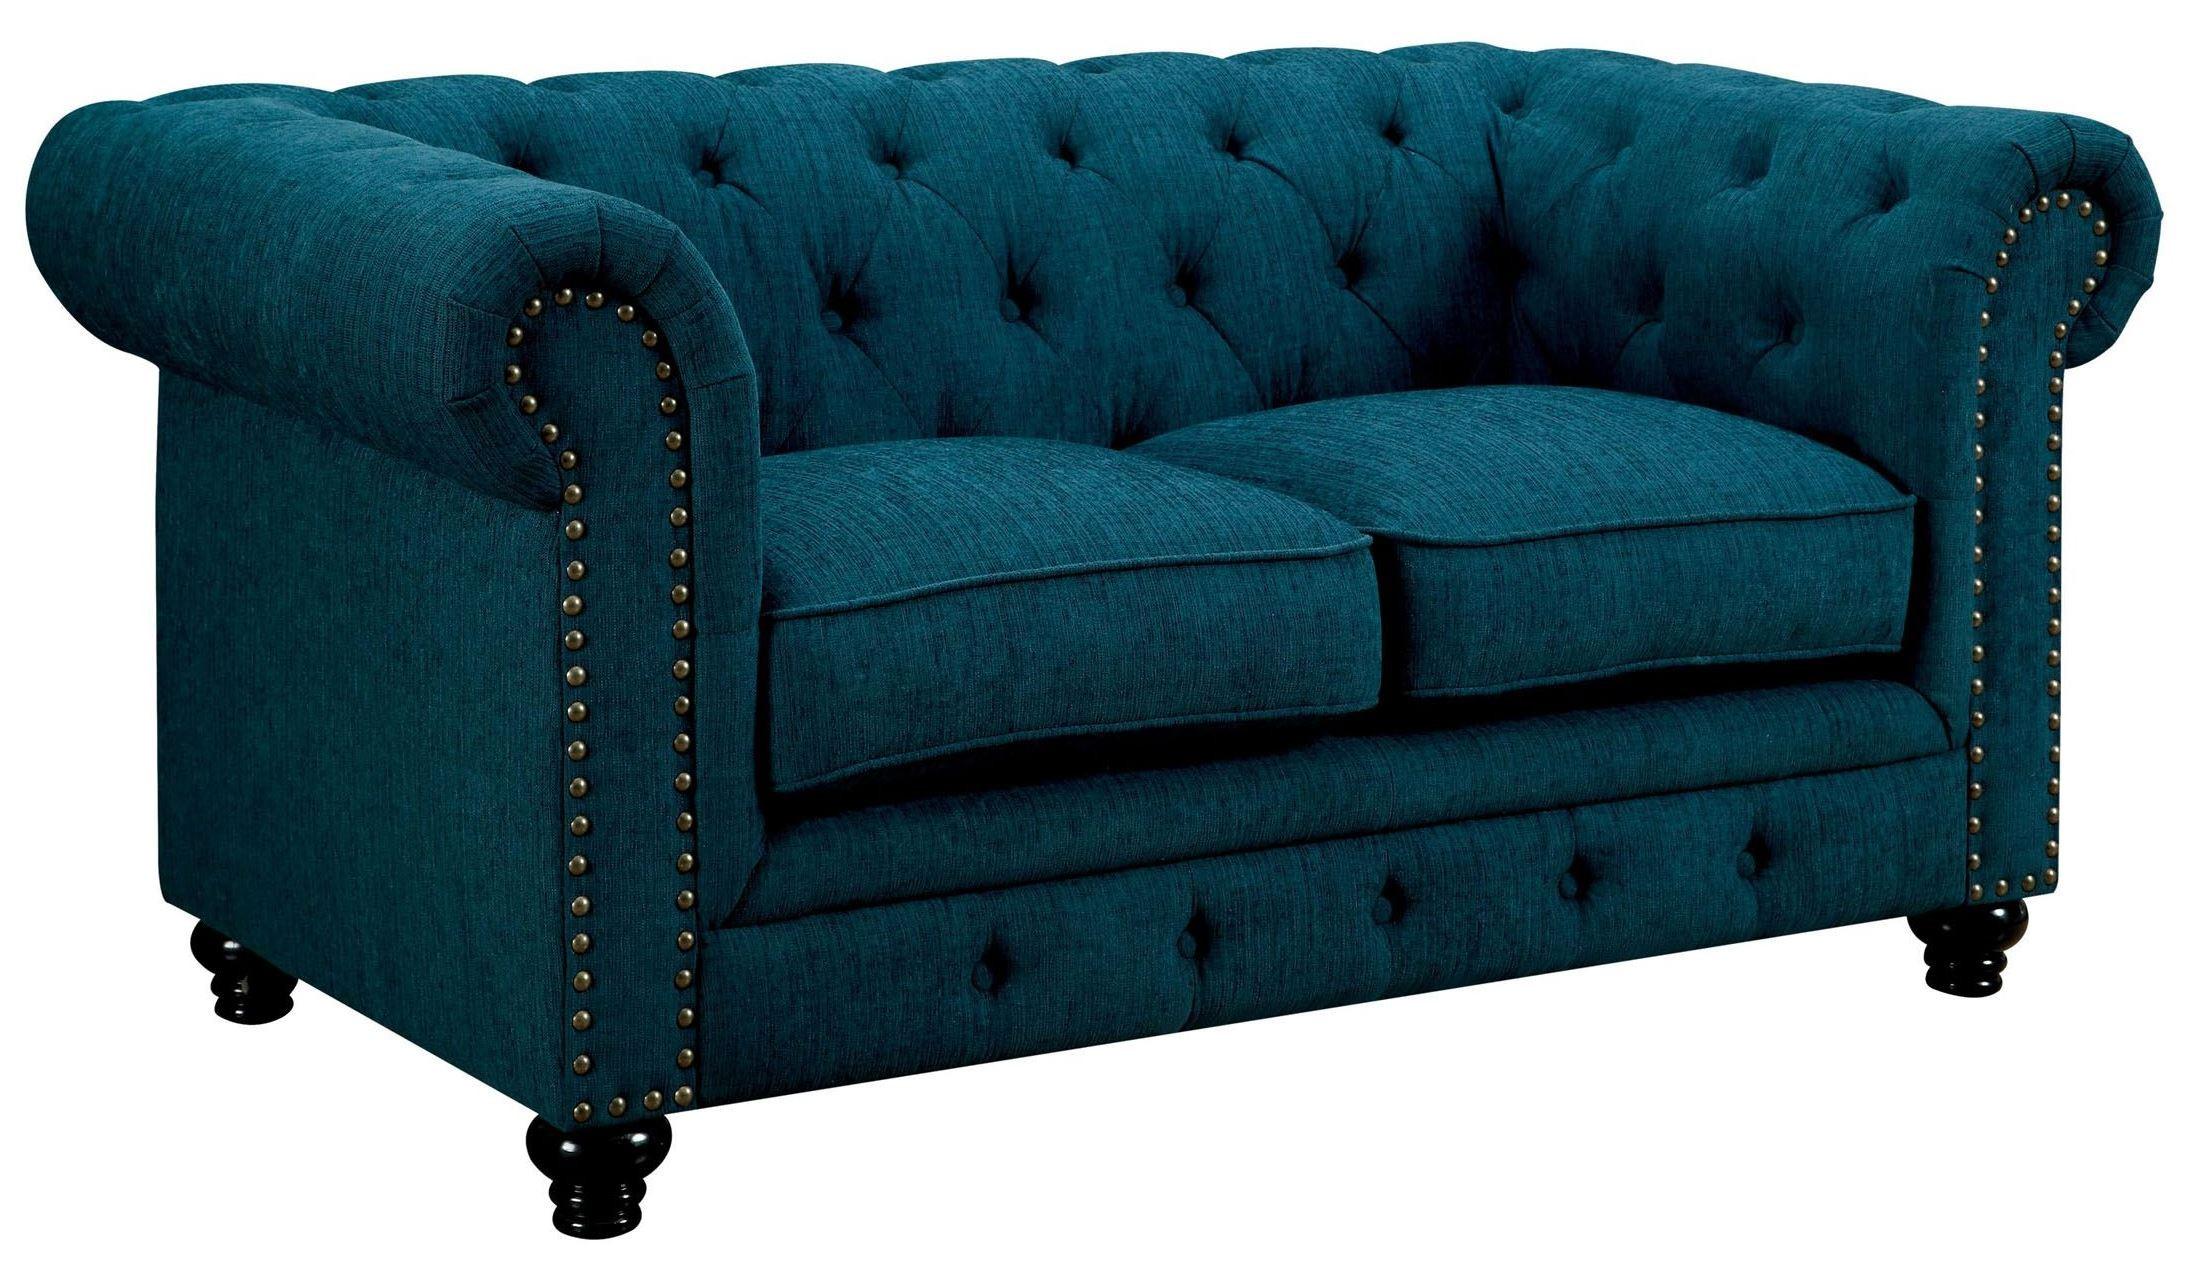 cheap teal sofas sofa olx espirito santo stanford dark fabric living room set from furniture